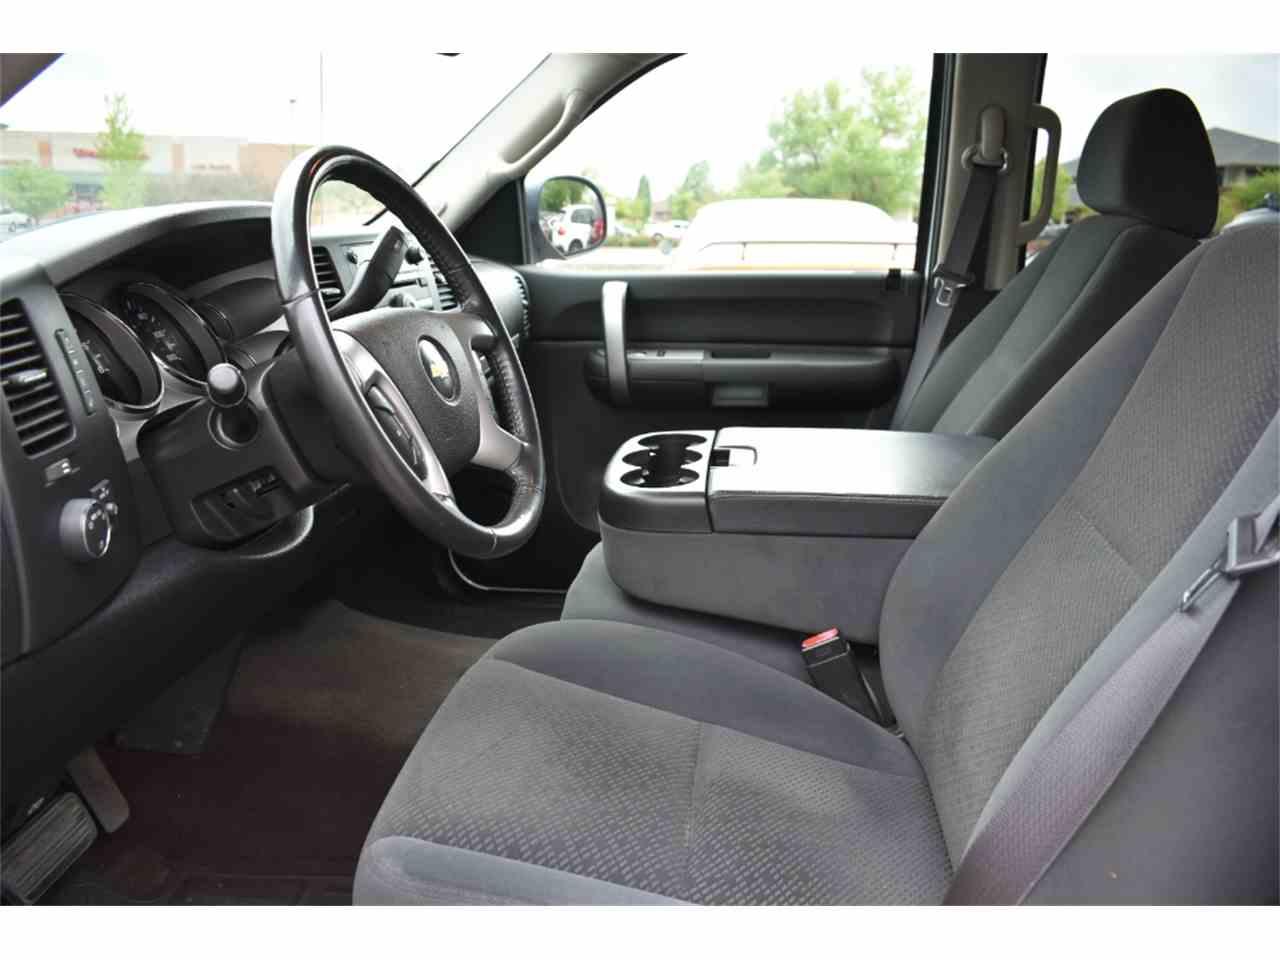 Large Picture of 2008 Chevrolet Silverado located in Colorado - $15,500.00 - LWD9